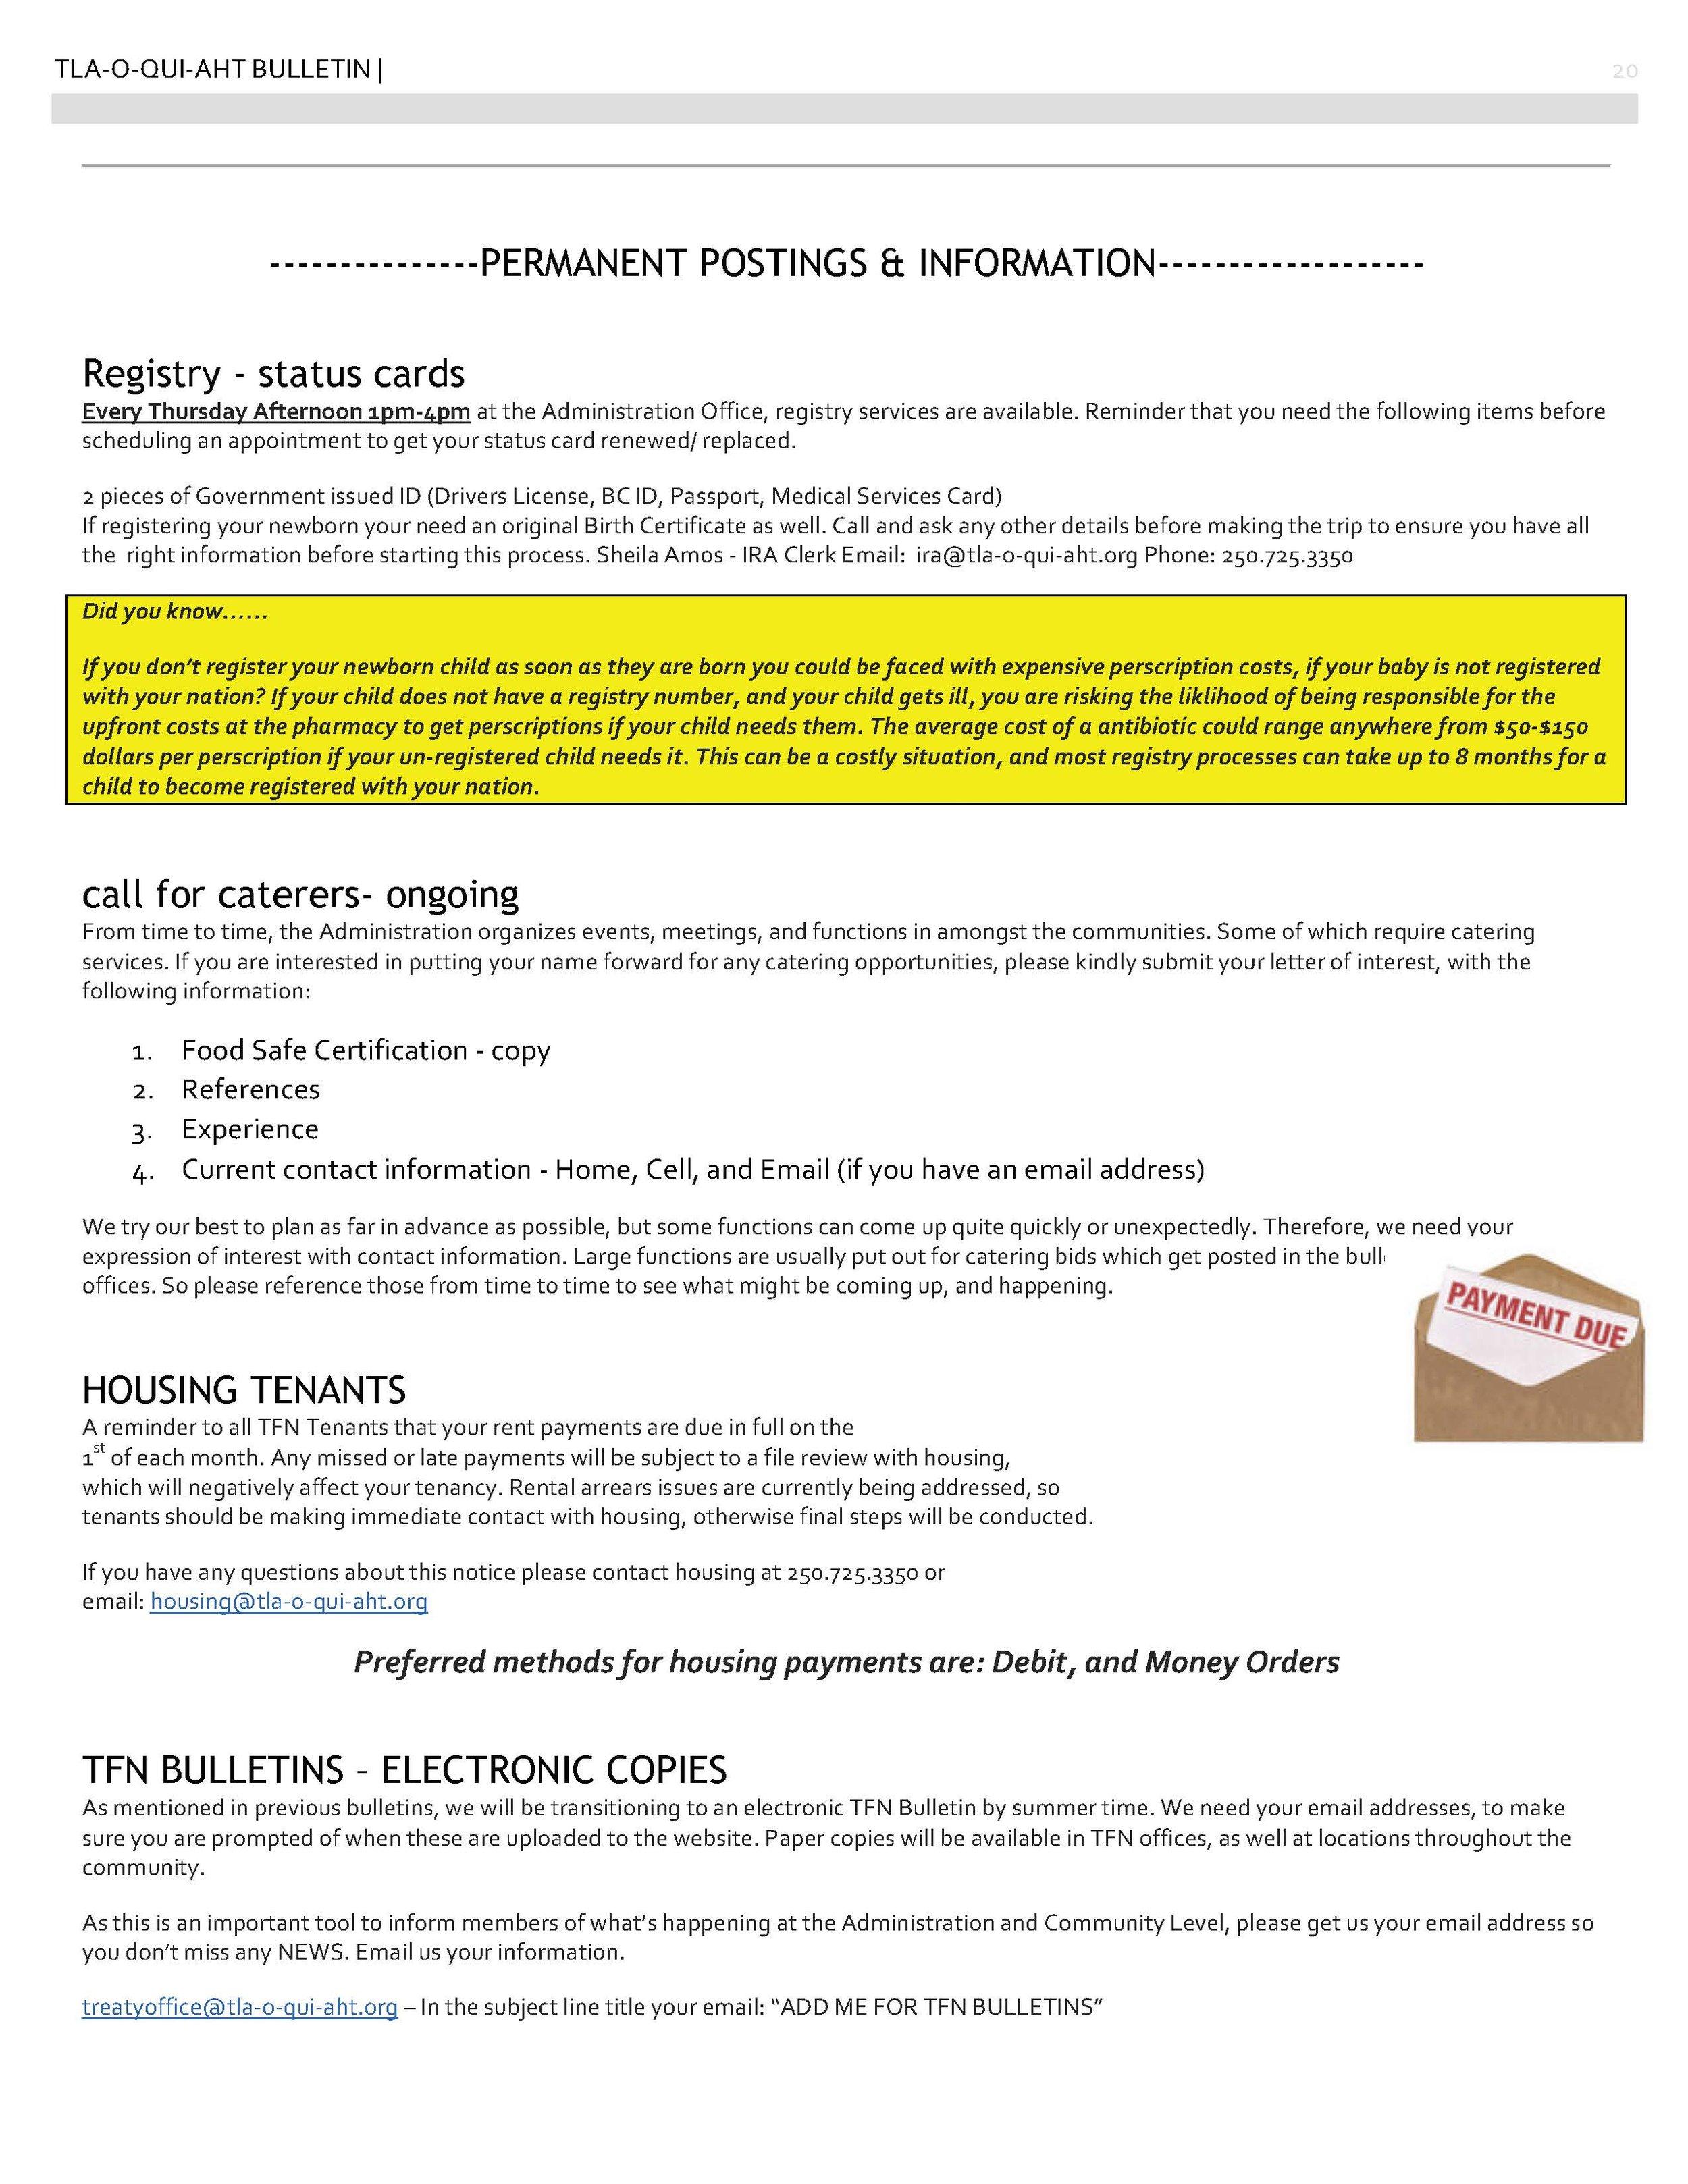 0TFN Bulletin Nov 15-2016_Page_20.jpg